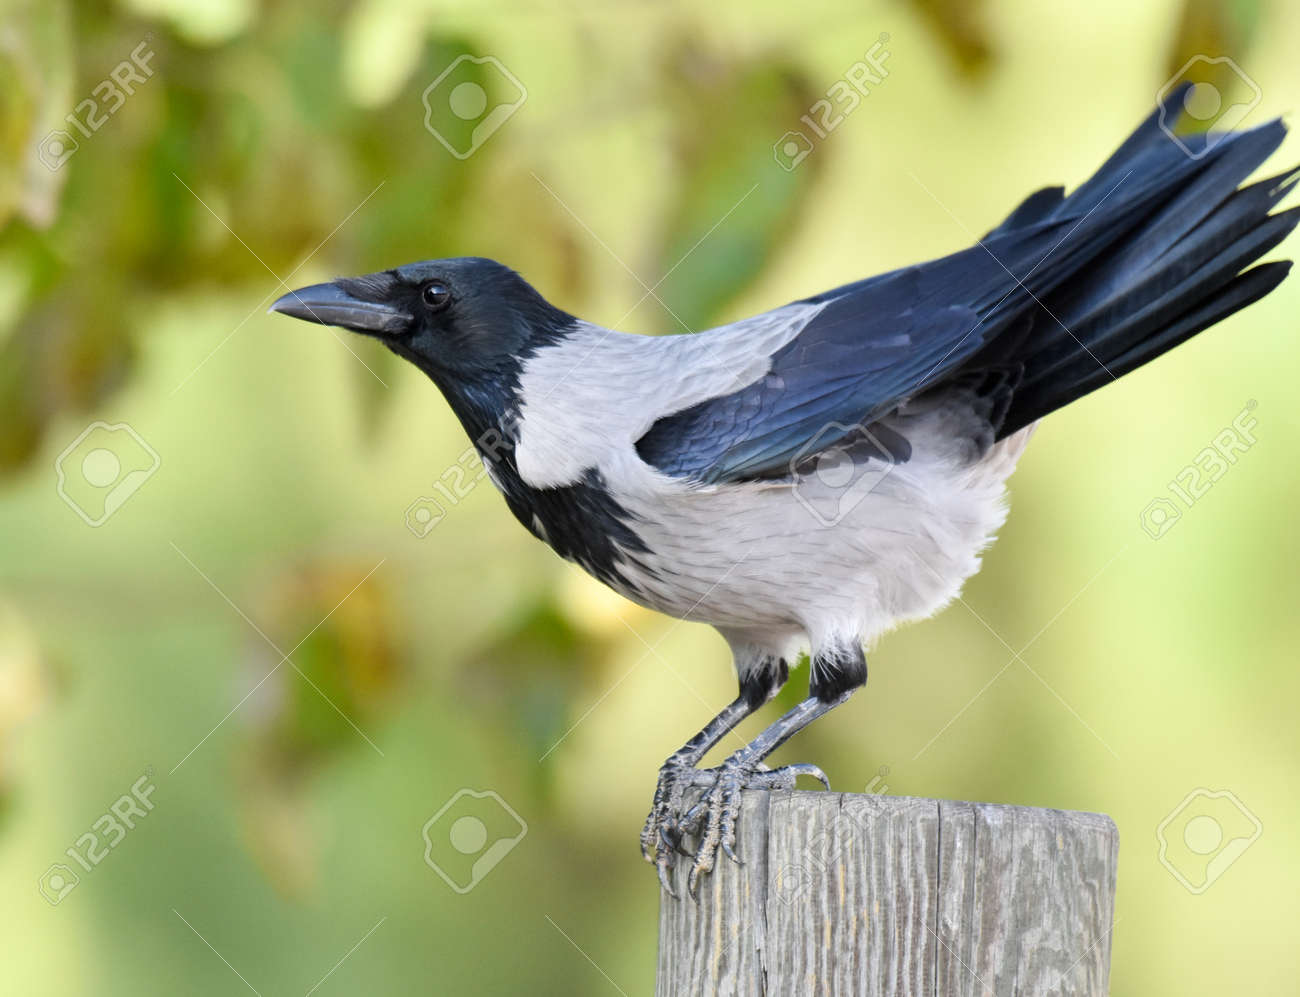 Crow blackbird standing on a wood - 165520063